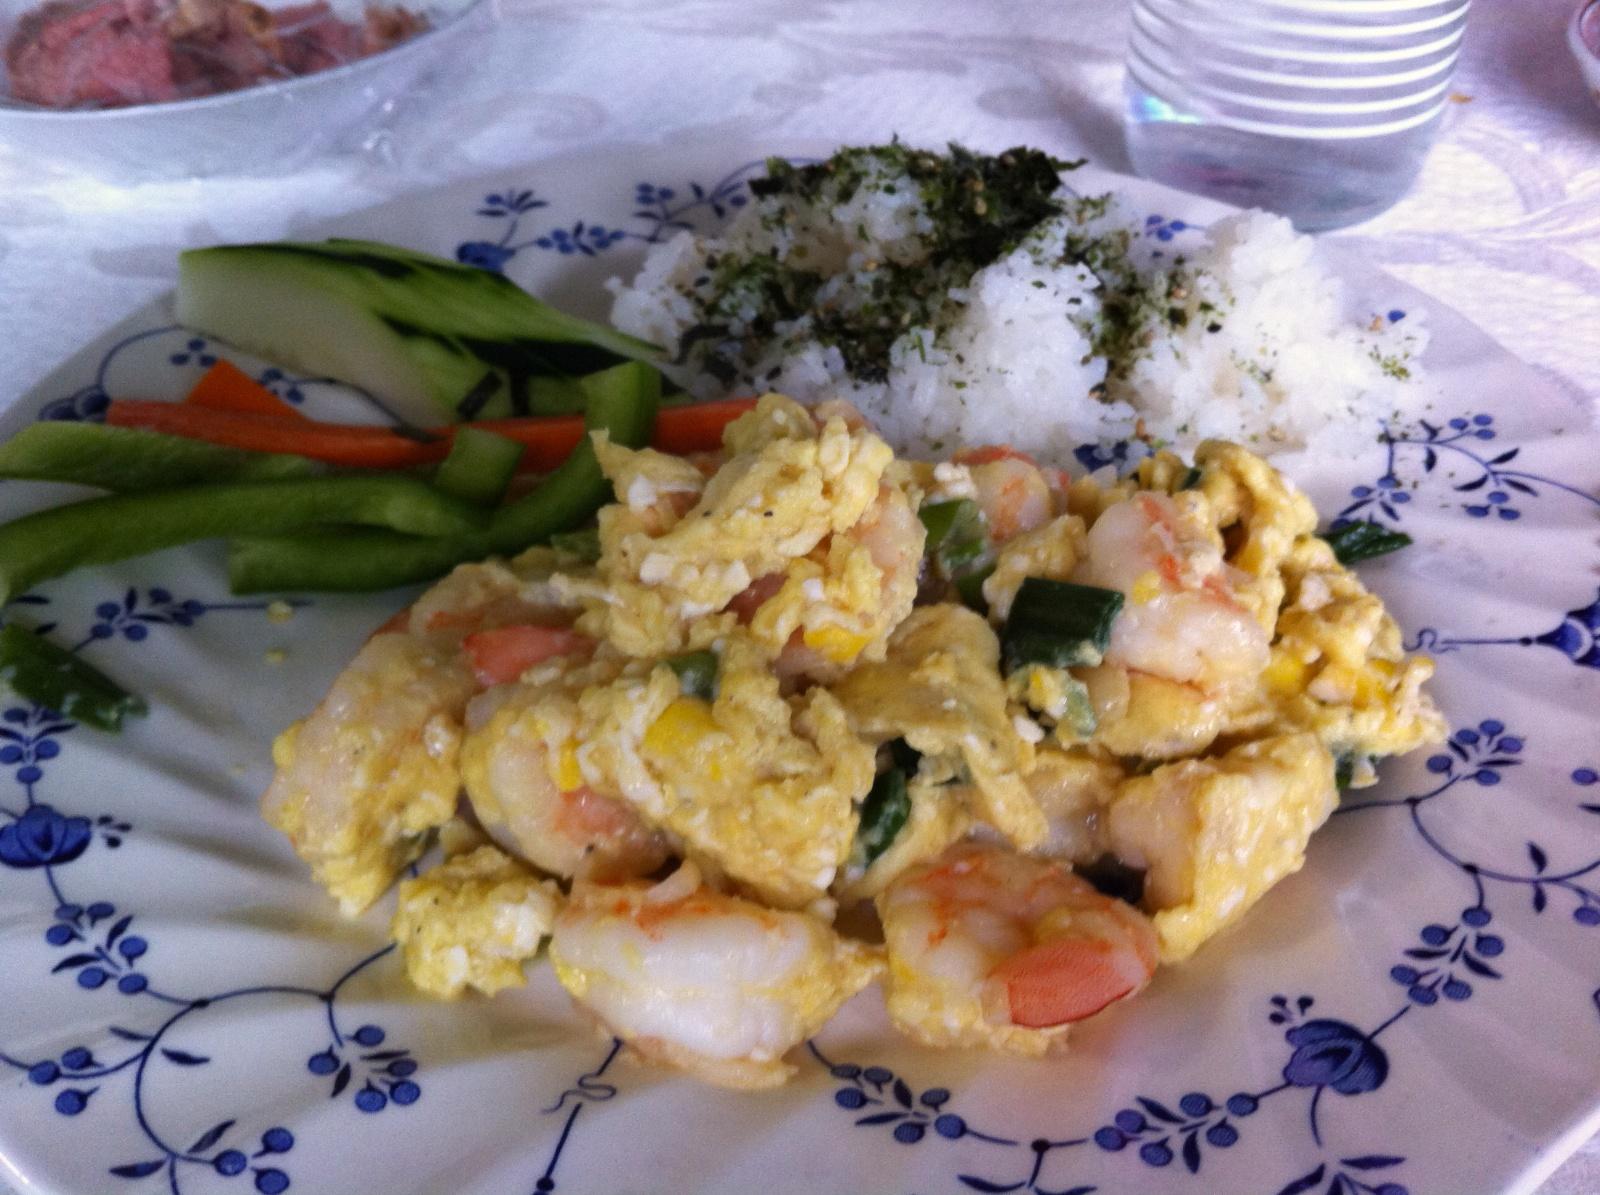 http://blog.rickk.com/food/2011/04/25/ate.2011.04.21.l.jpg